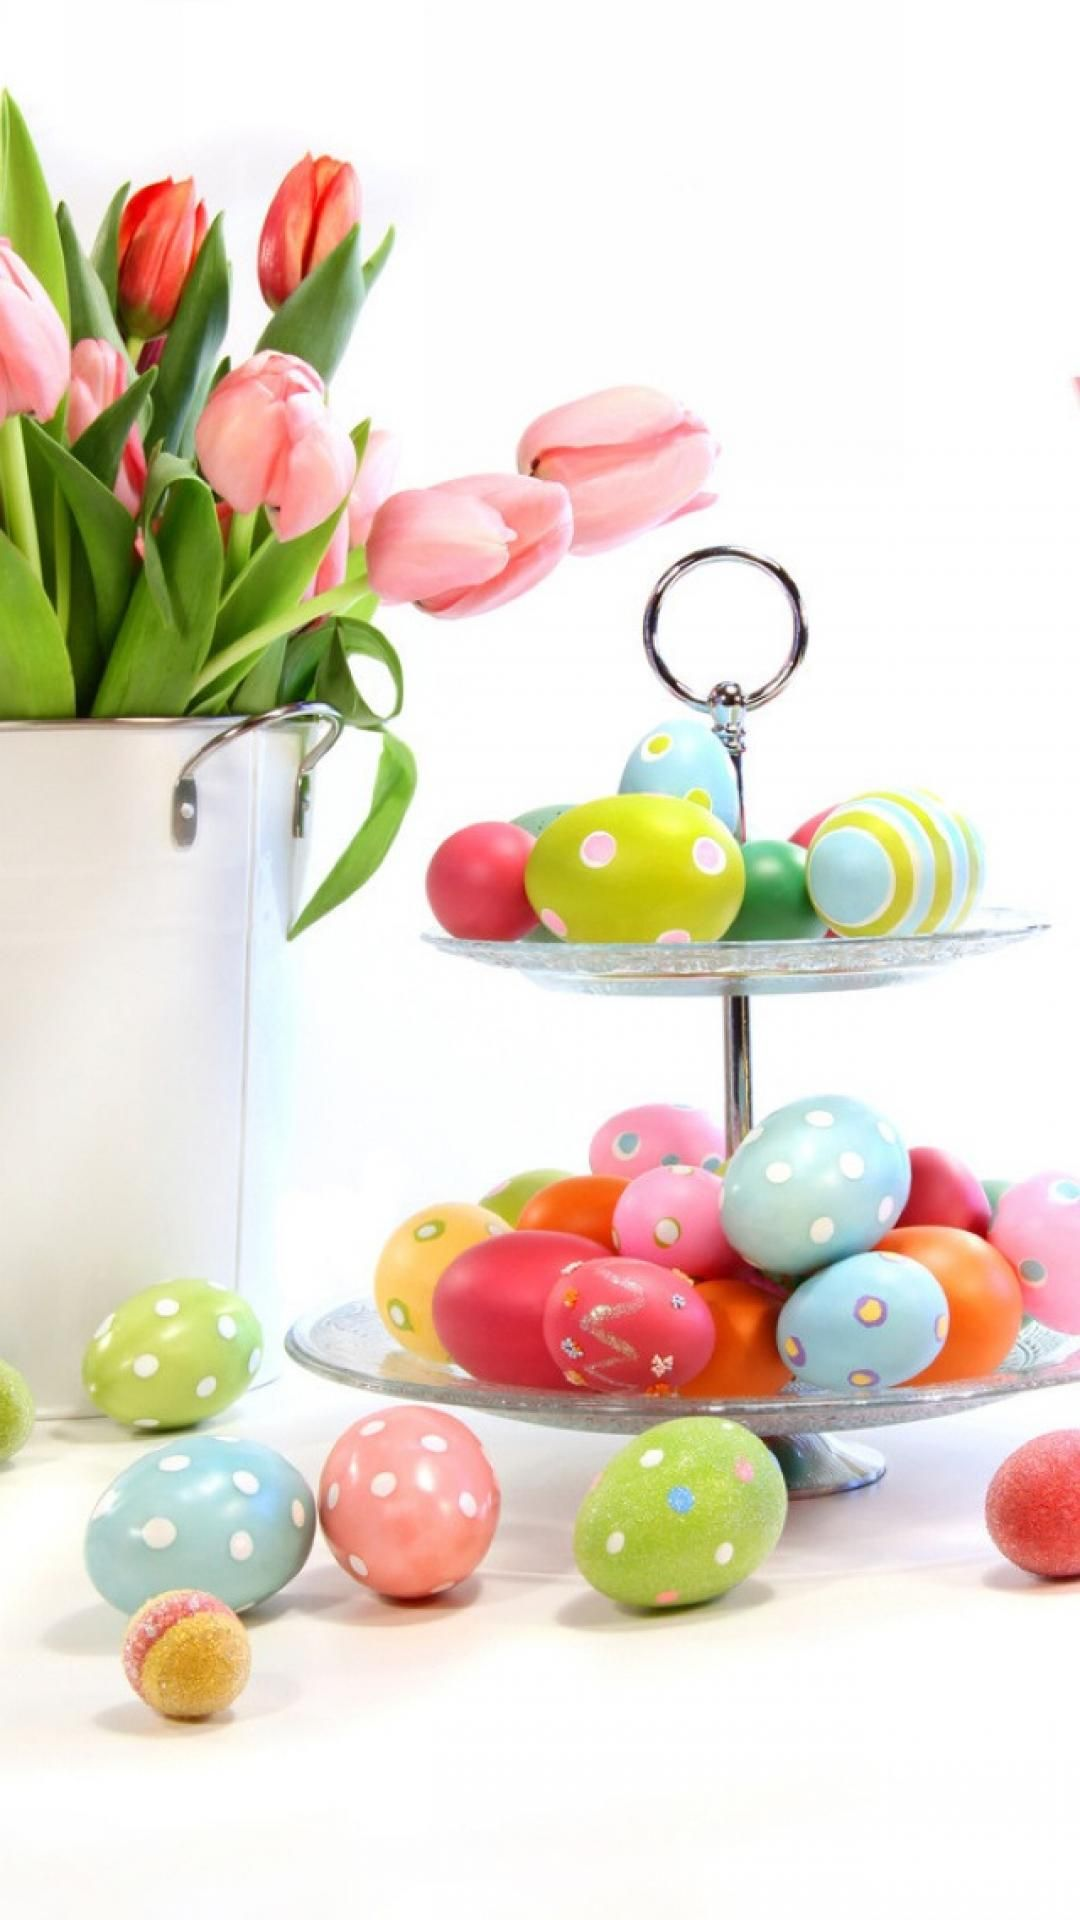 iPhone 6 Wallpaper Easter wallpaper, Easter, Easter crafts